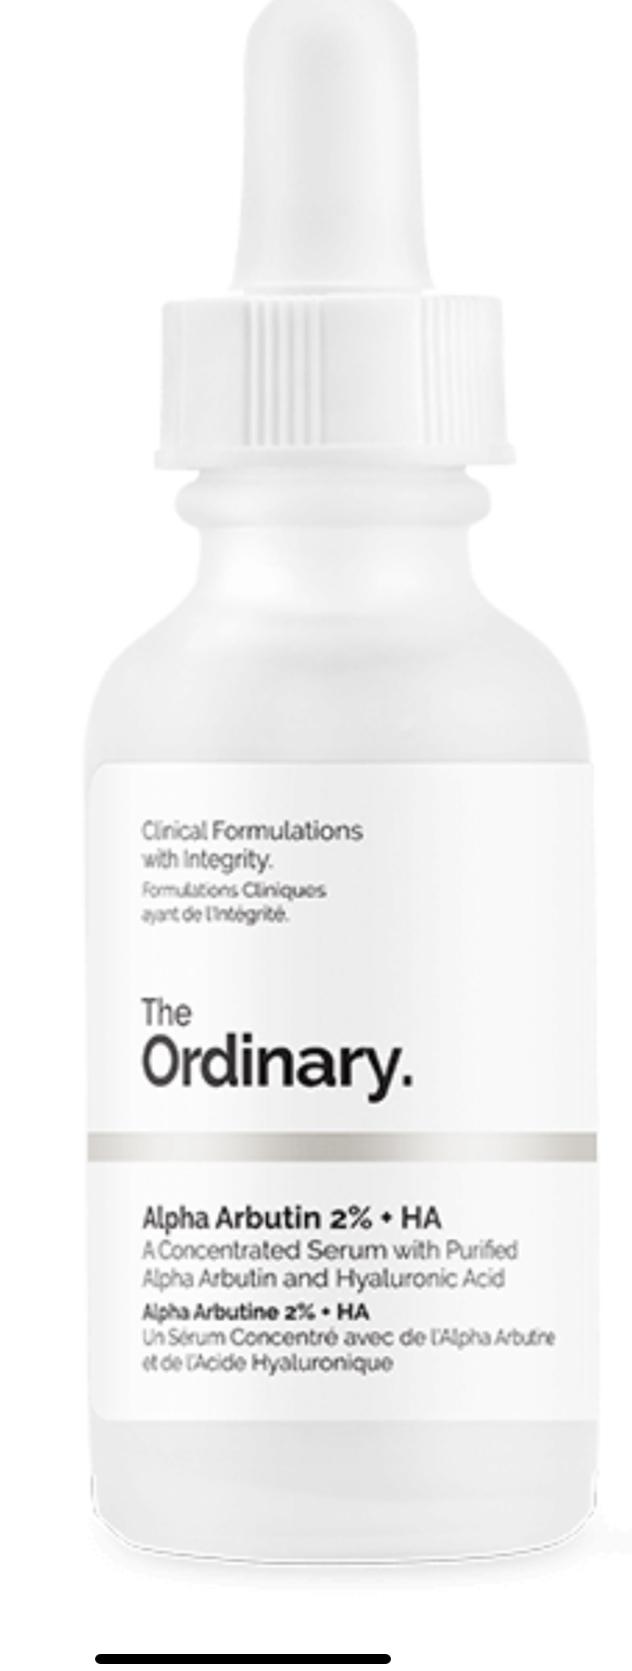 The Ordinary Alpha Arbutin 2 Ha Reviews In Blemish Acne Treatments Chickadvisor